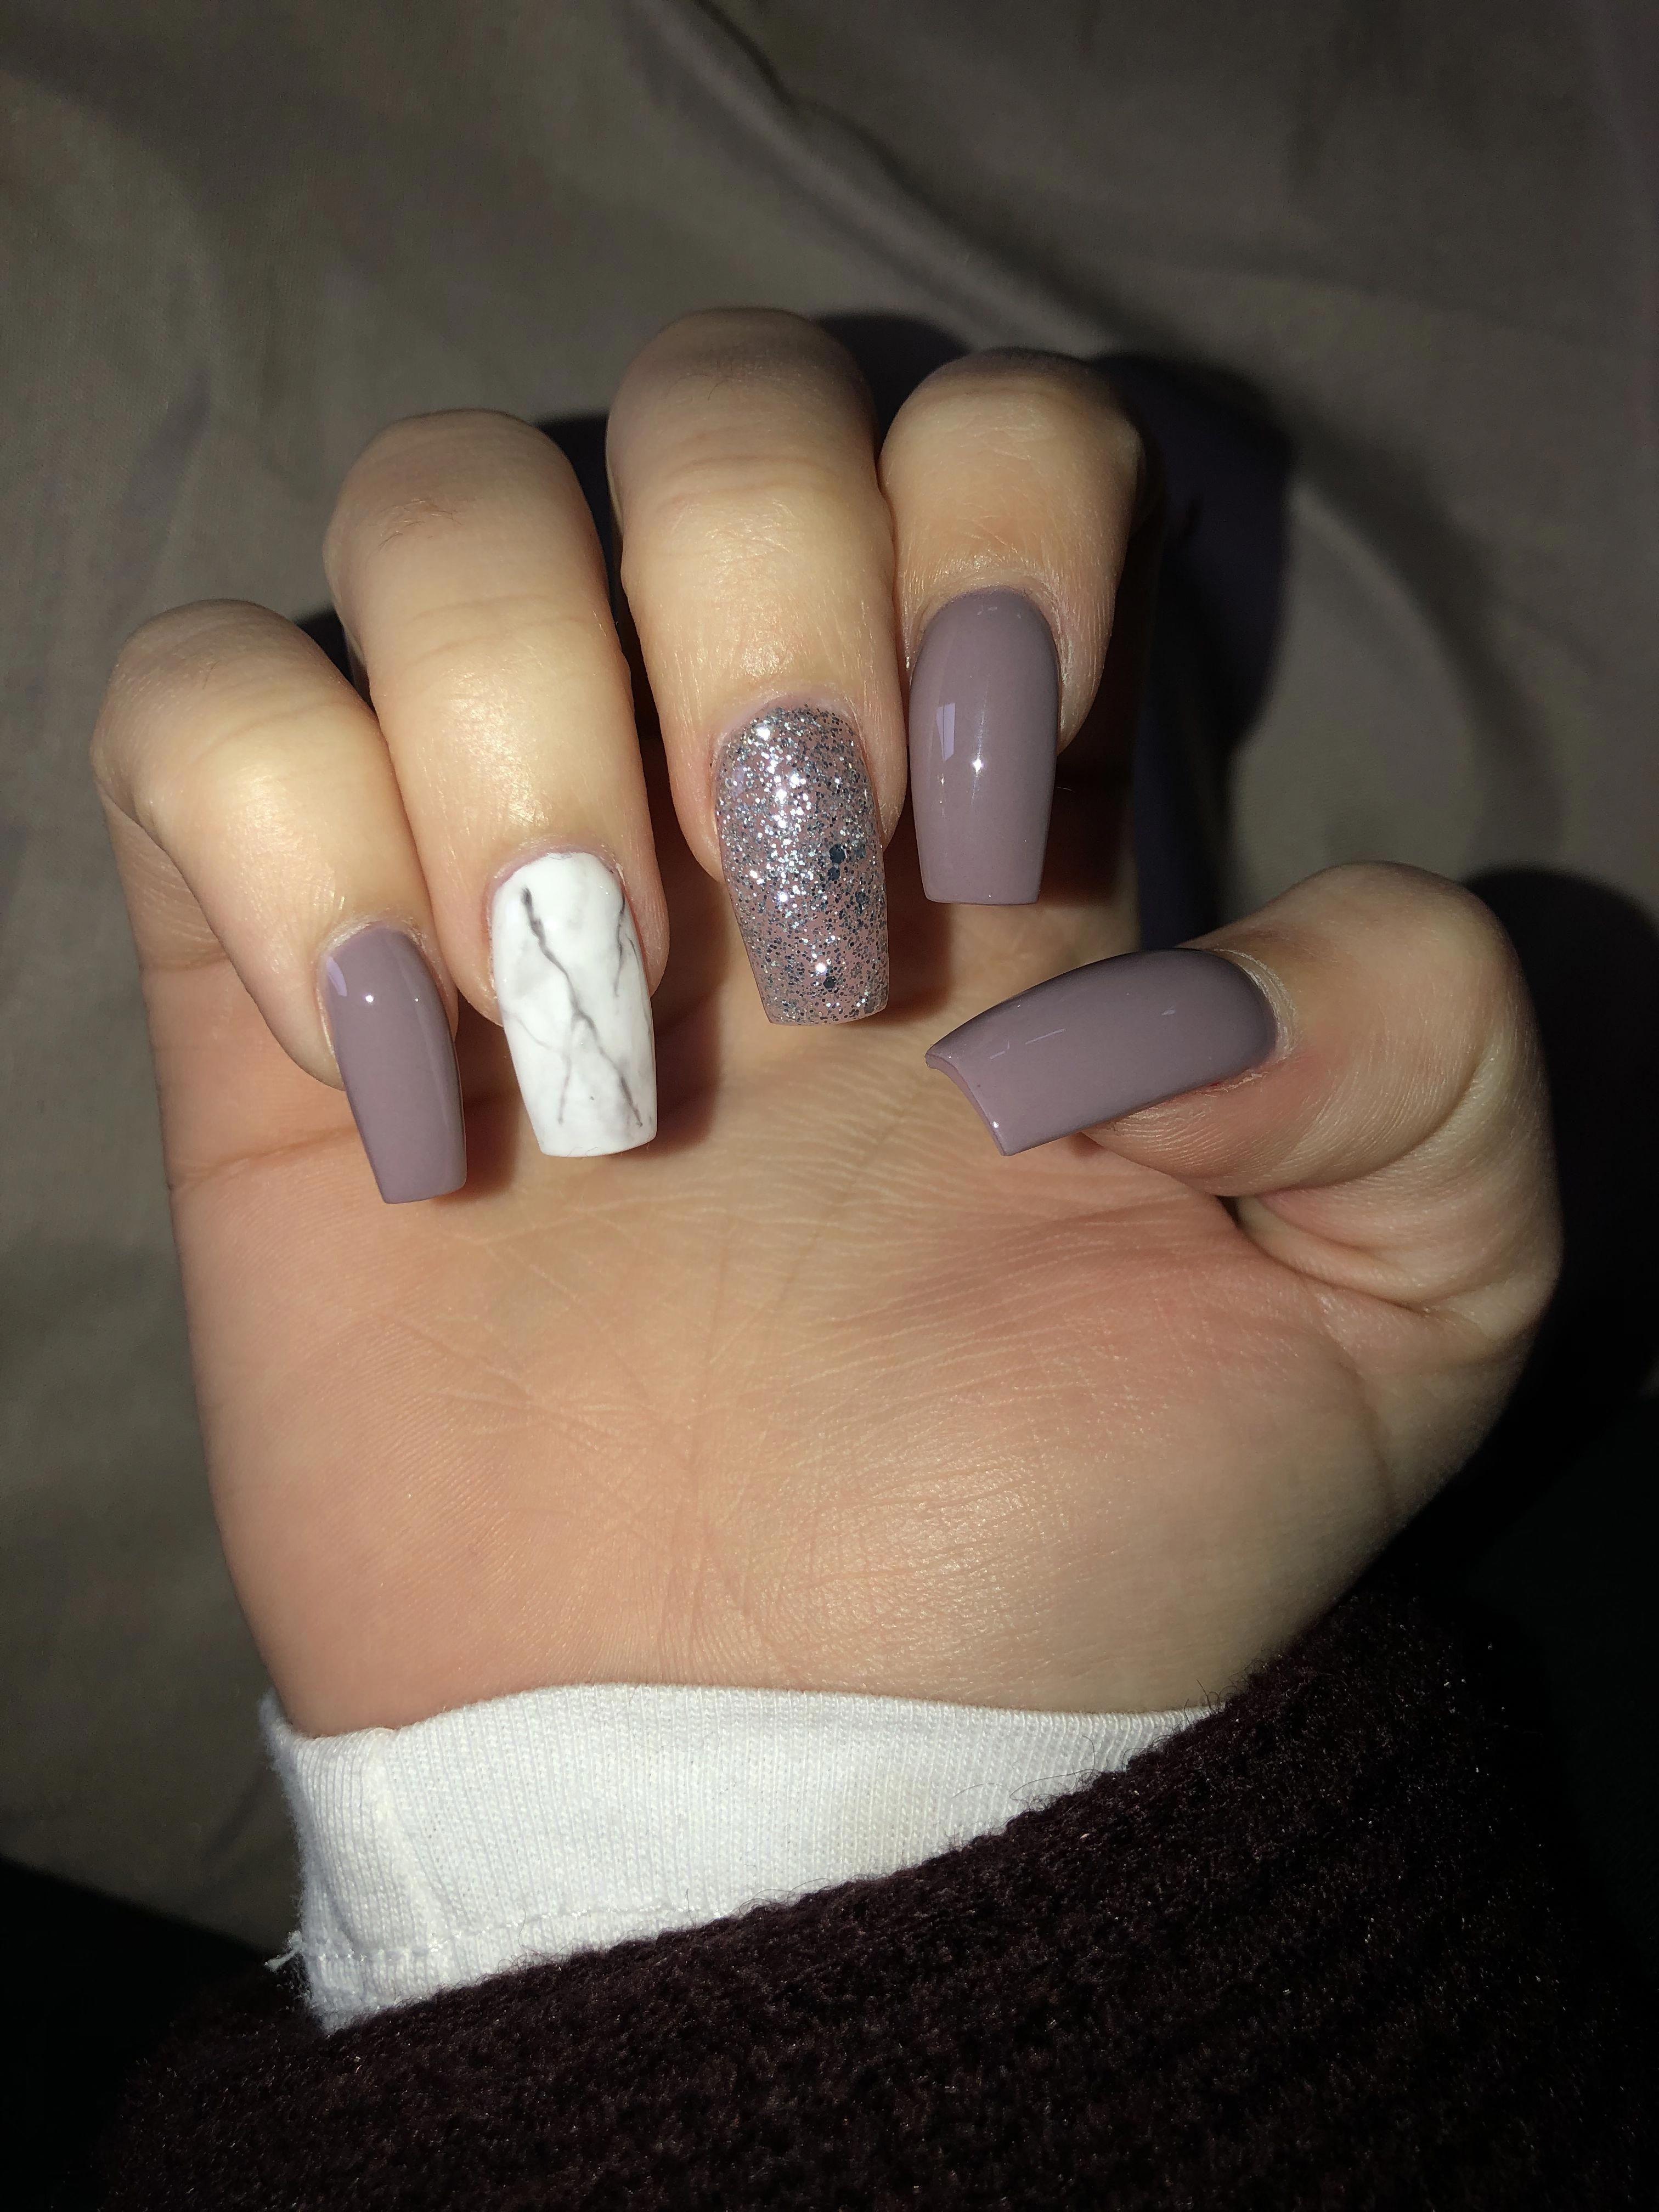 perfect10 nails acrylic gel pretty fall marblenails